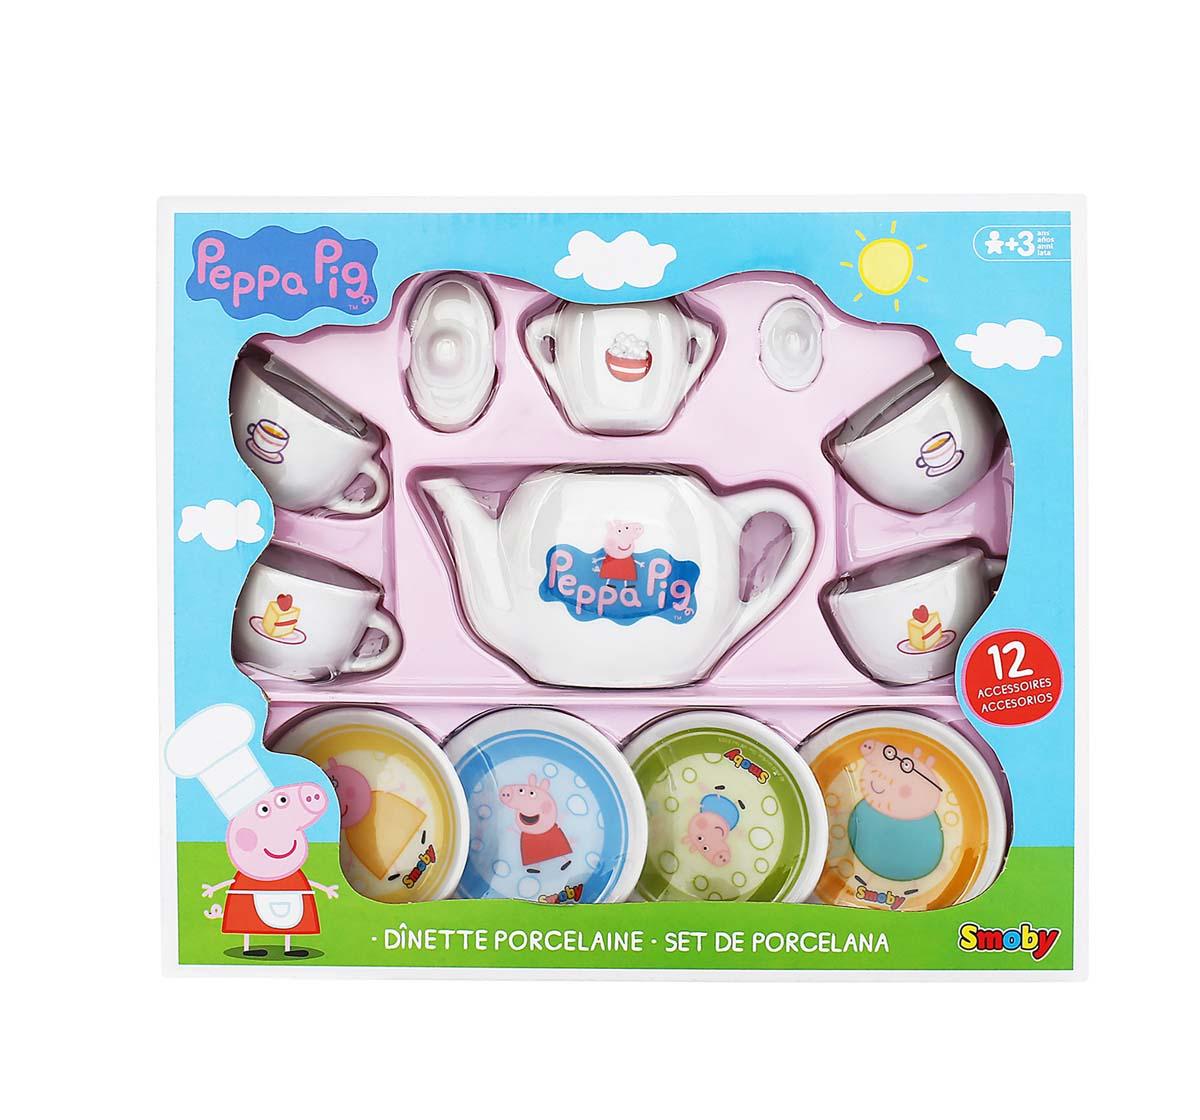 Peppa Pig | Peppa Pig Smoby and Porcelain Tea Set Kitchen Sets & Appliances for Girls age 3Y+